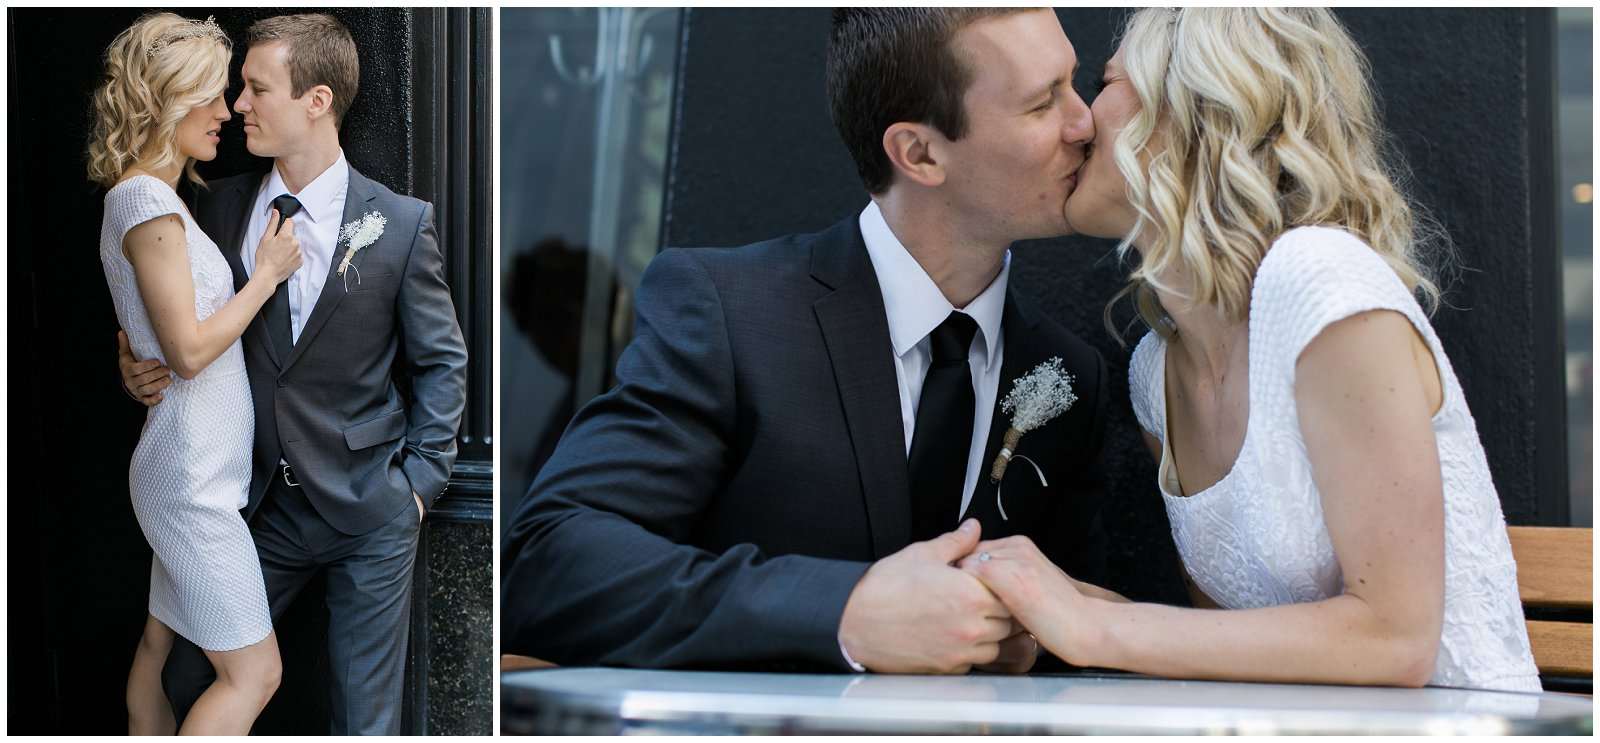 San-Francisco-Bay-Area-Wedding-Photography-City-Hall-24.jpg